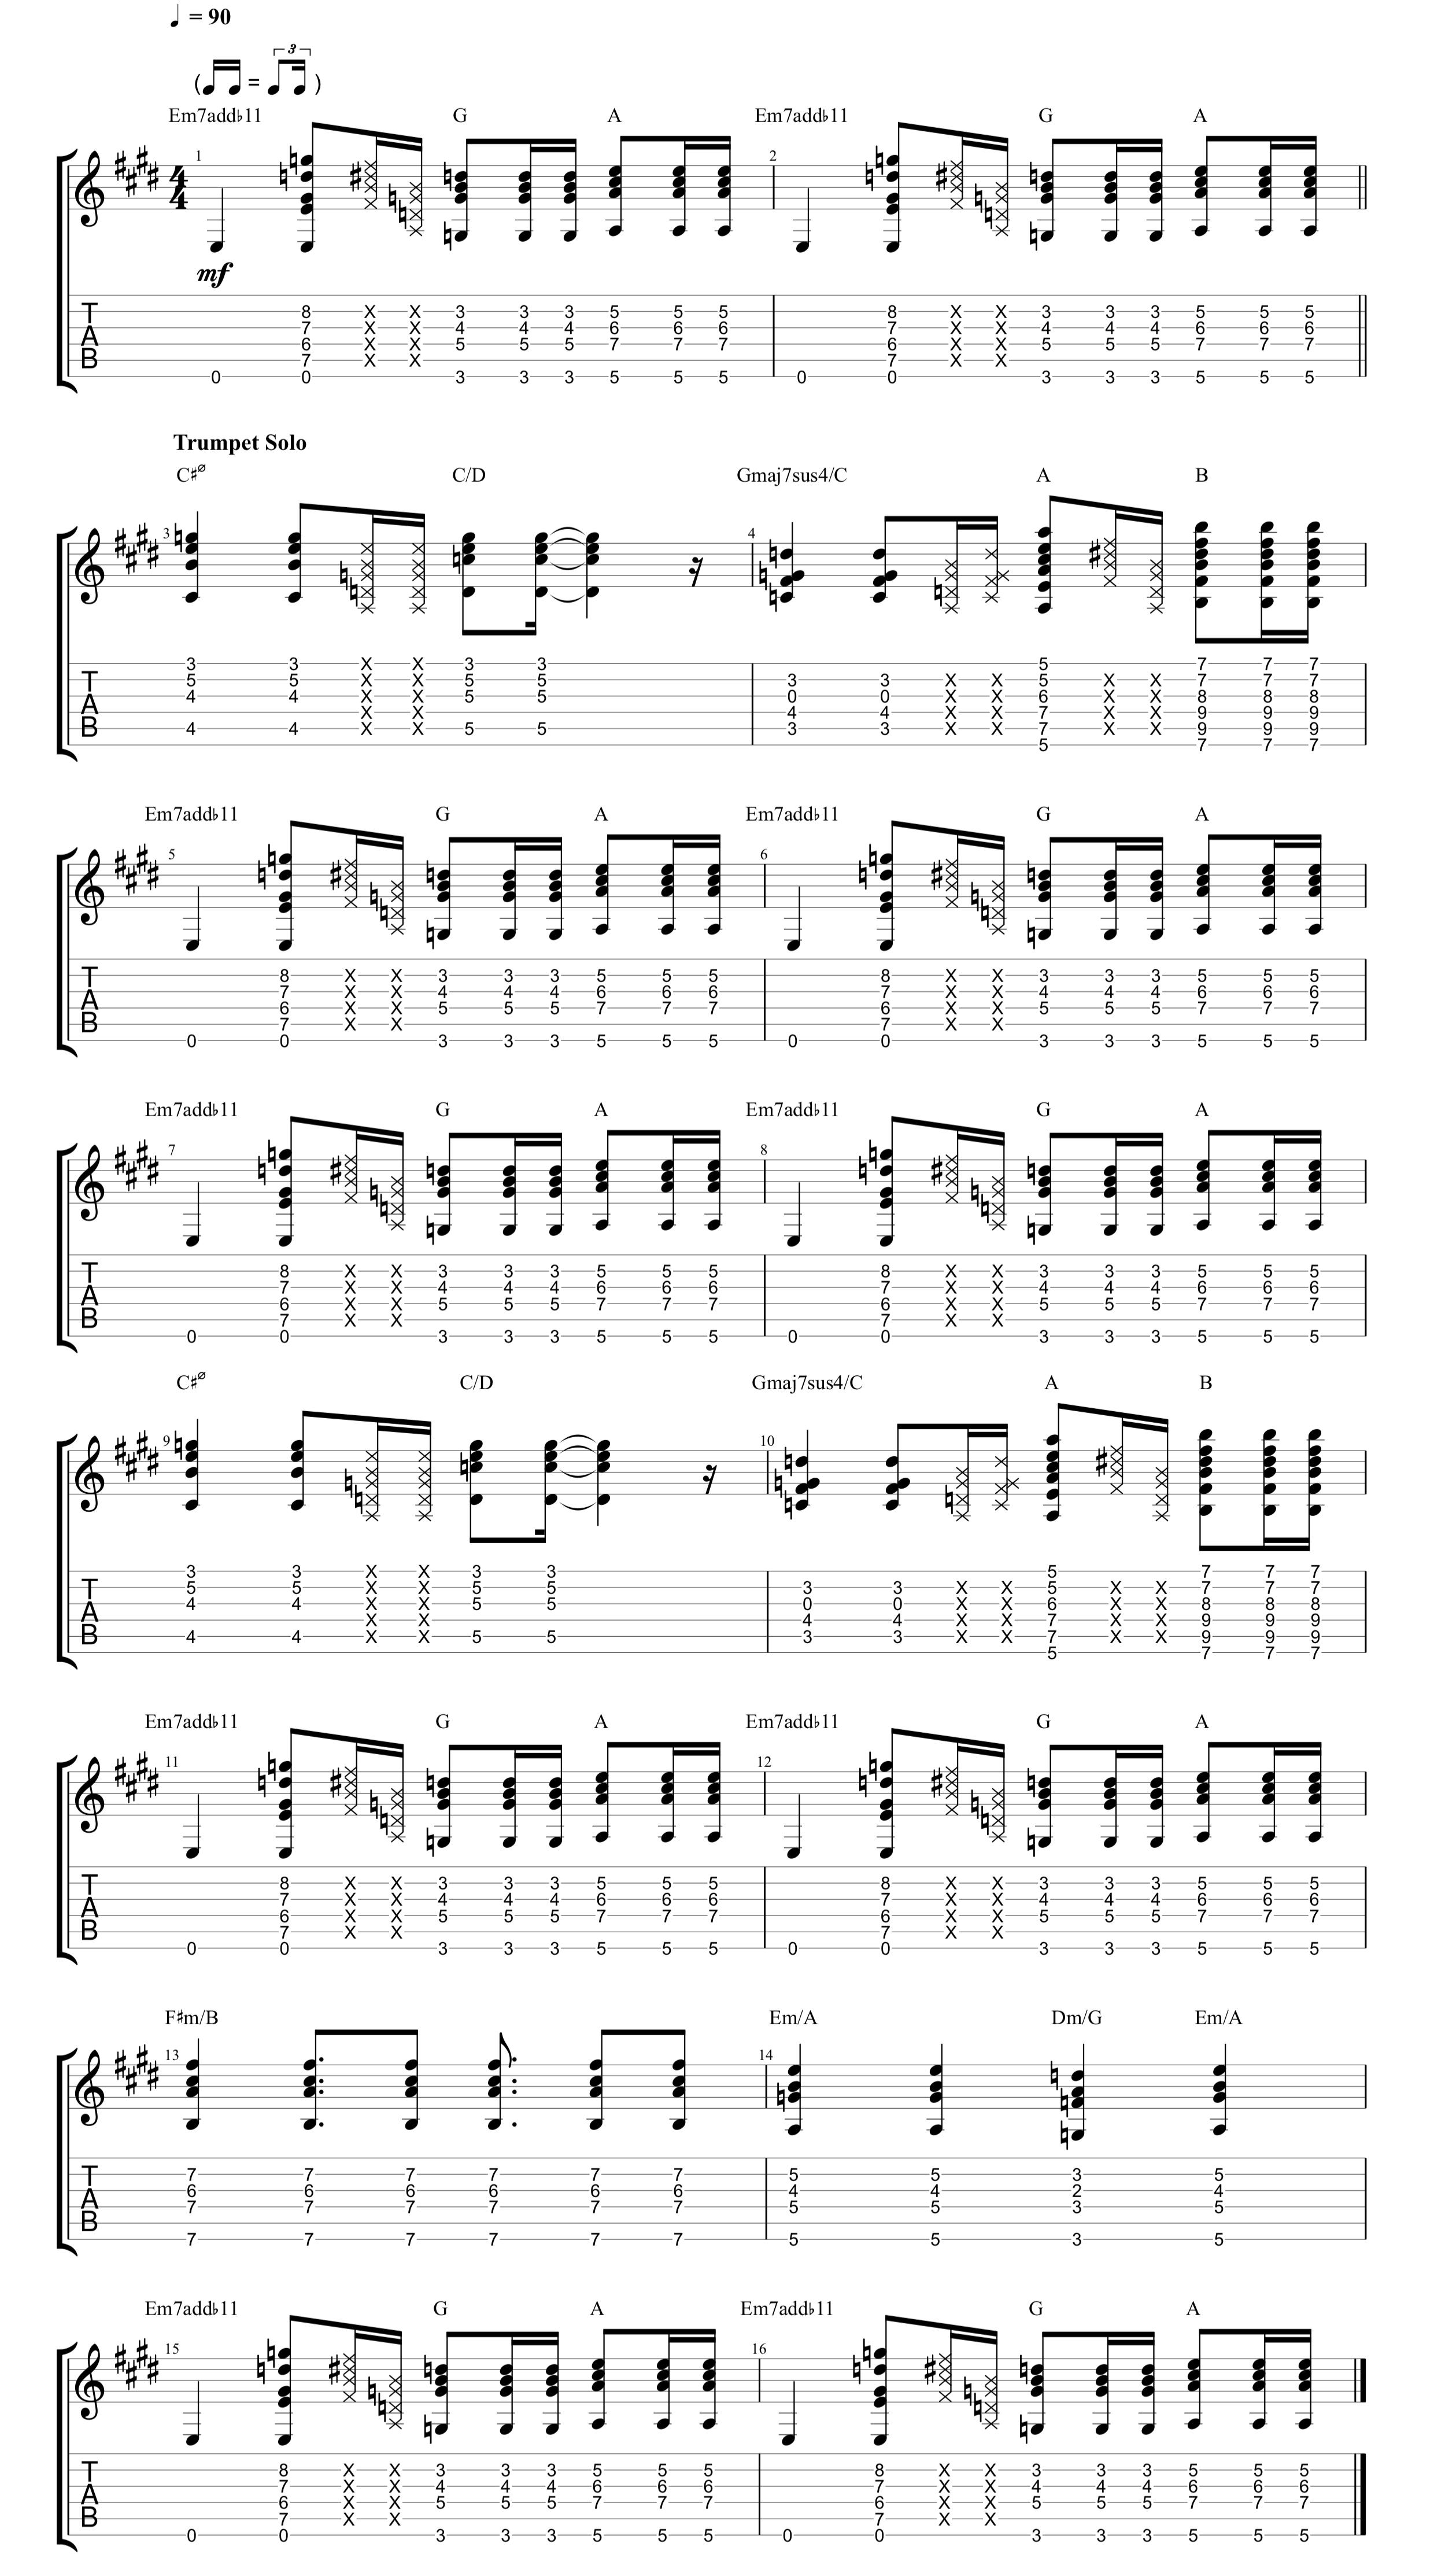 Trumpet Solo Chord Progression.jpg